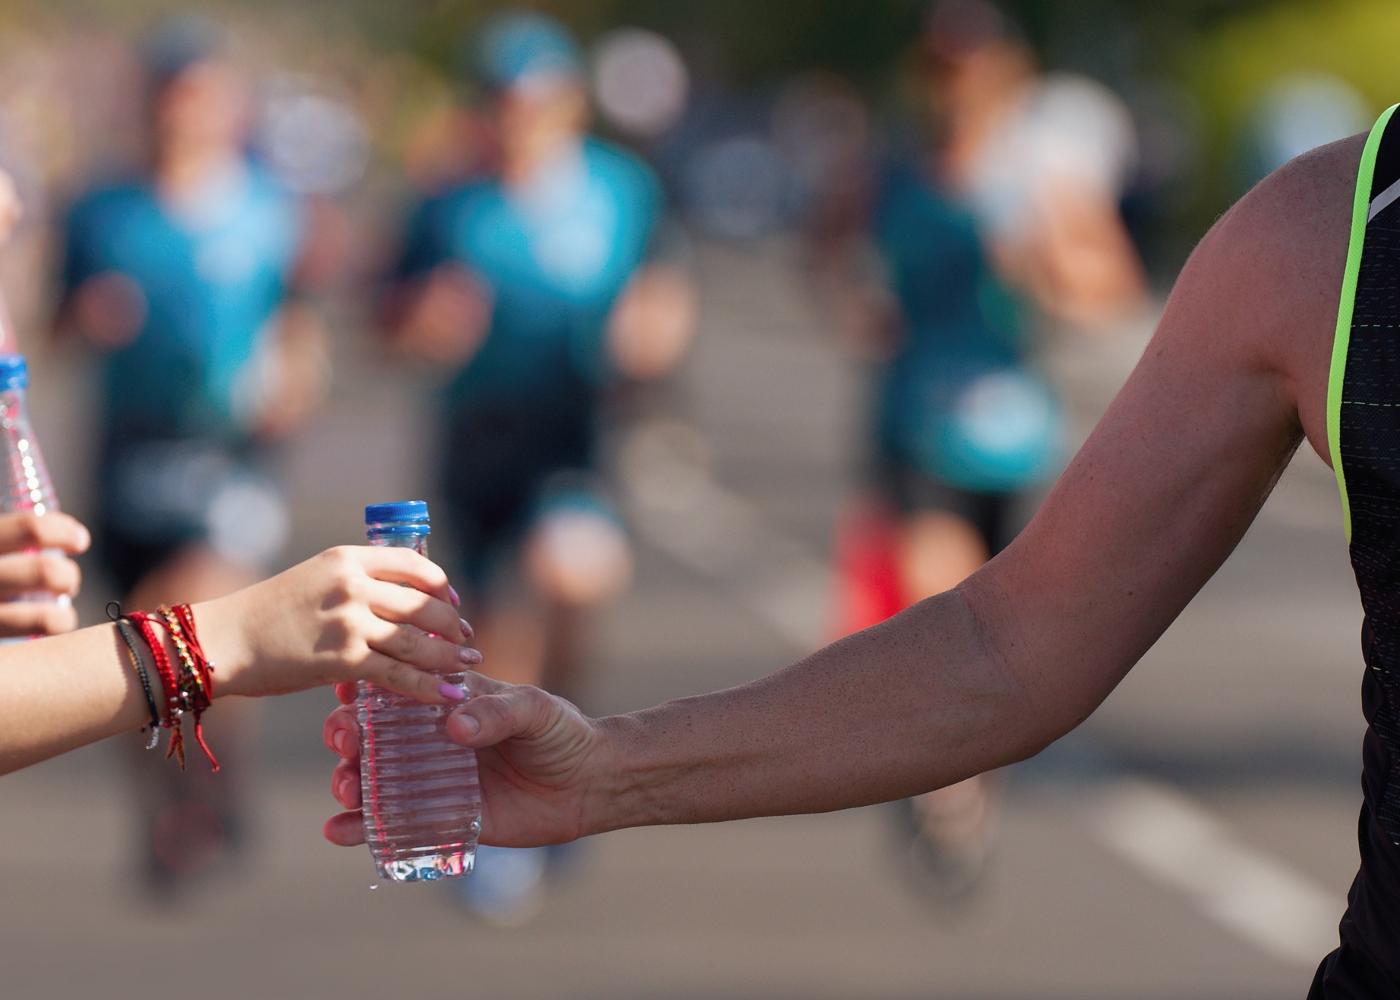 Atleta a abastecer-se de água numa maratona